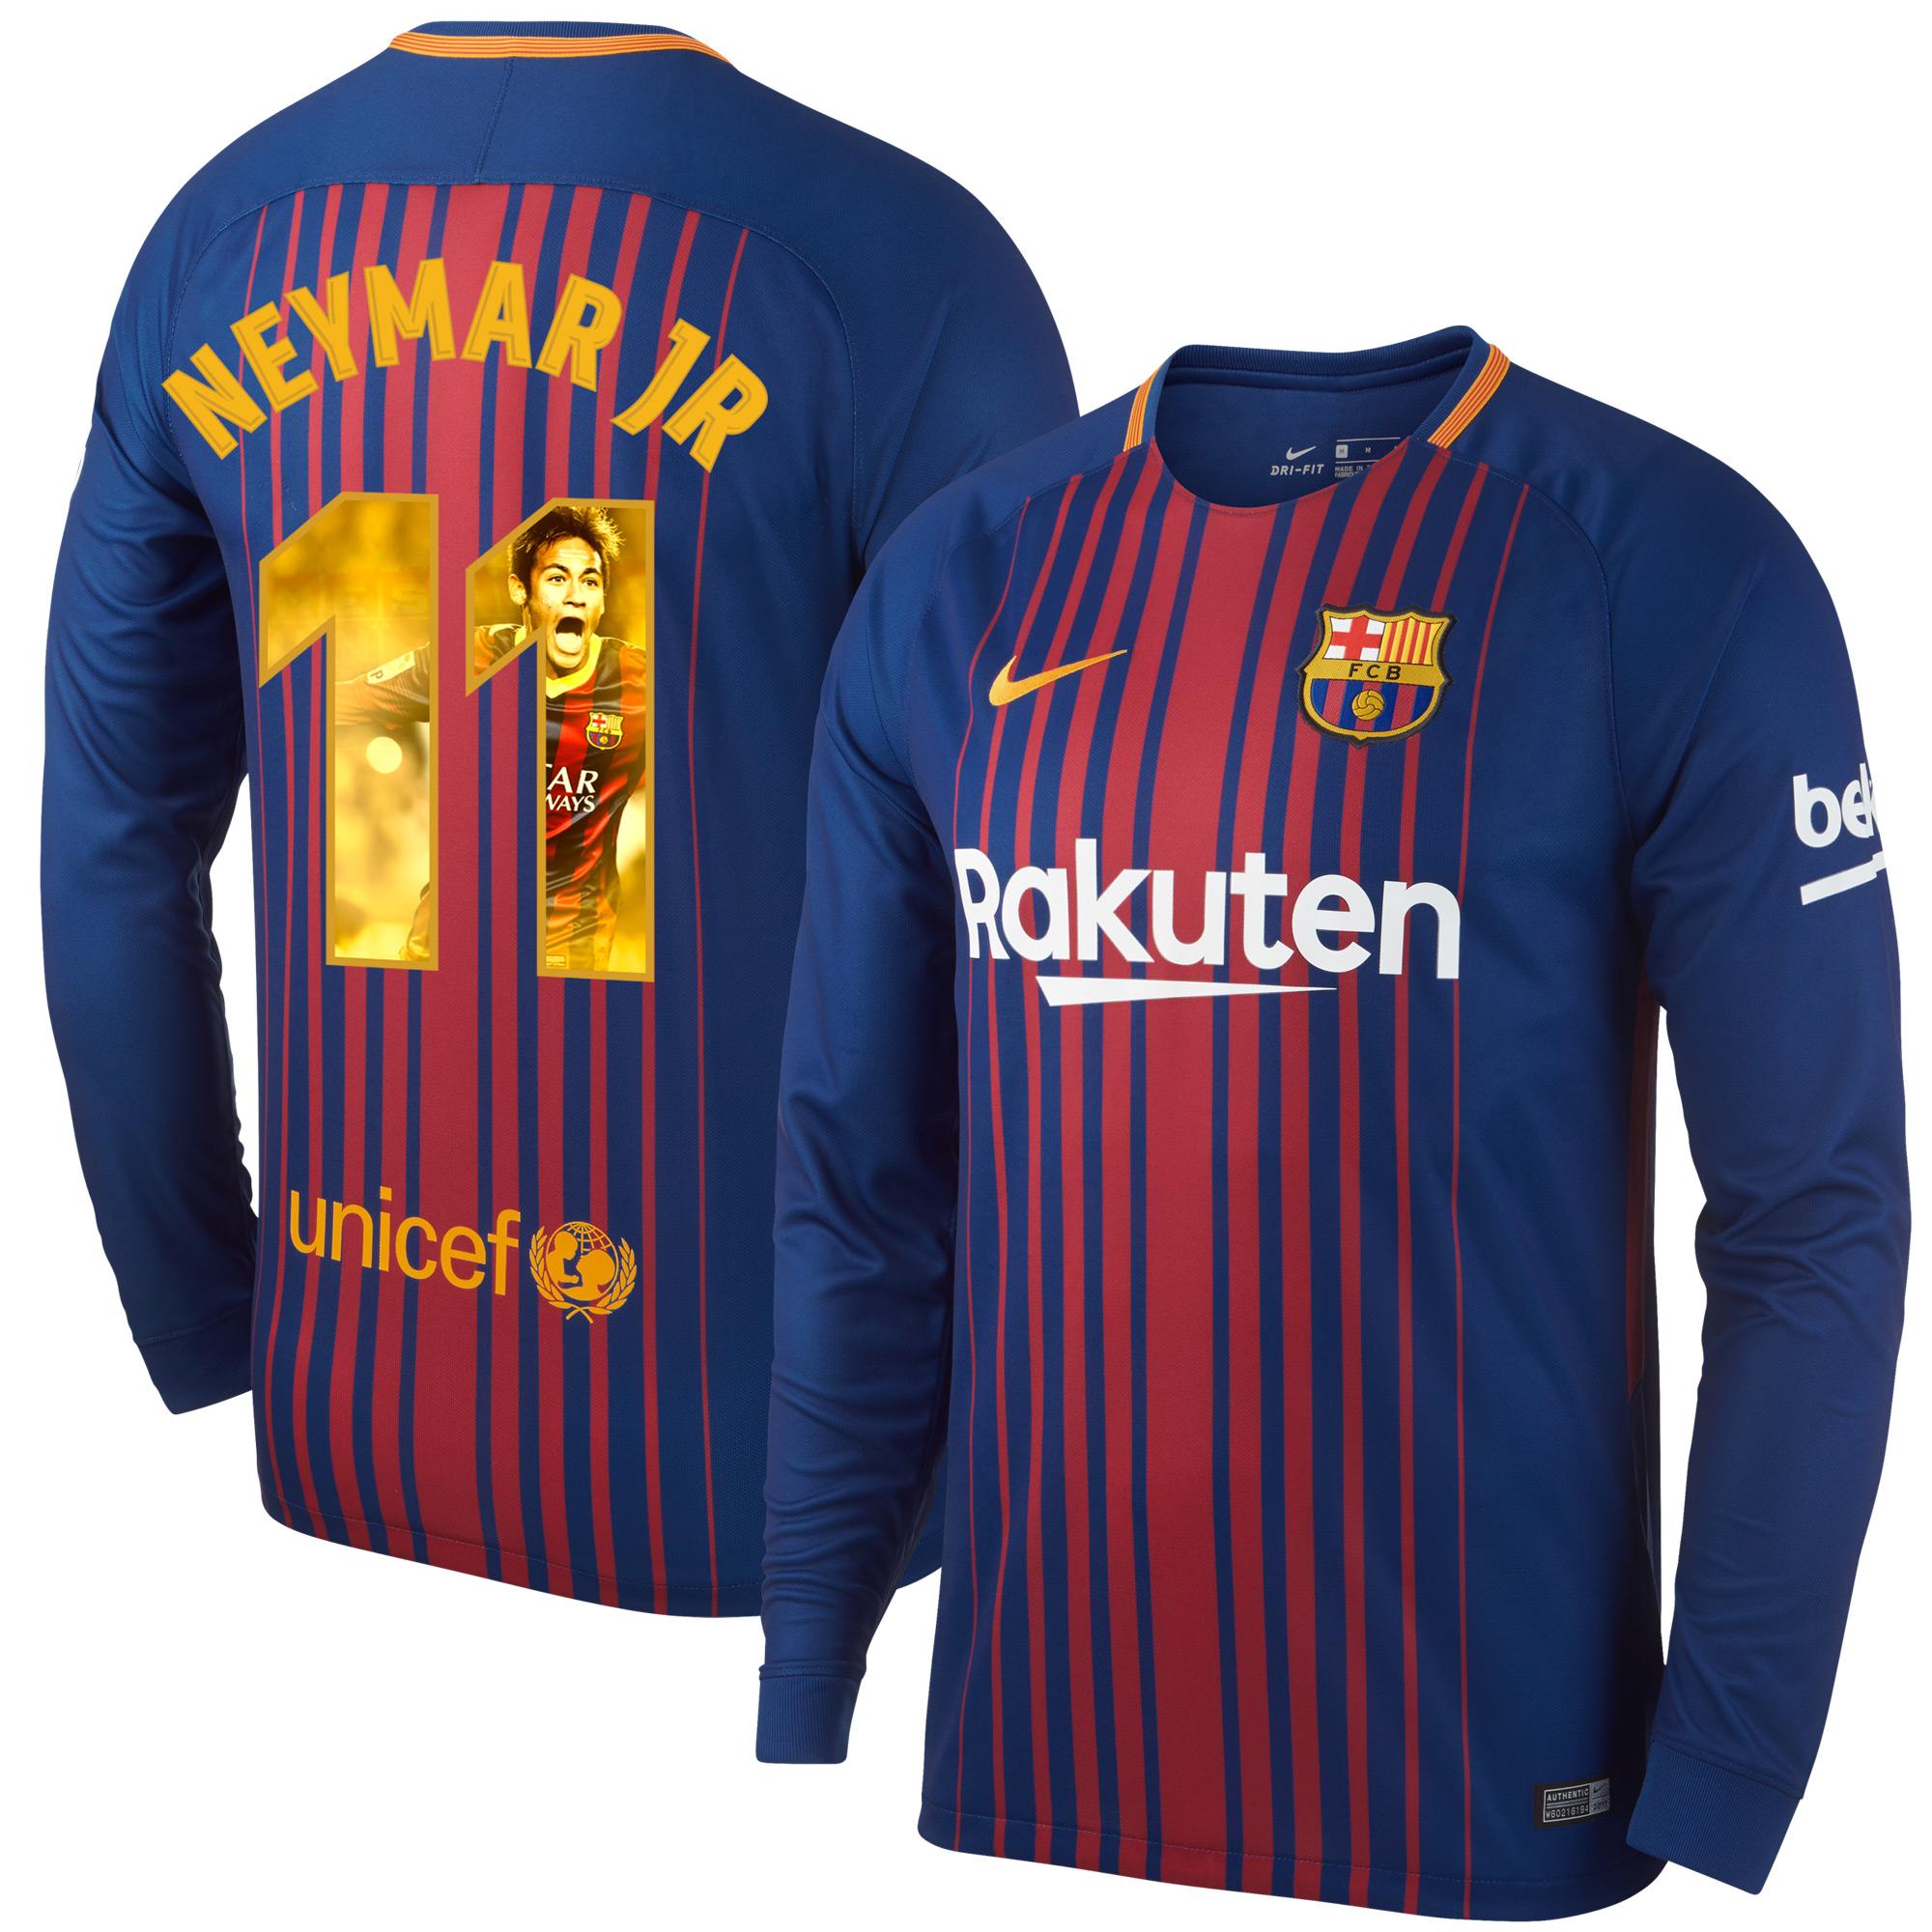 Barcelona Home L/S Neymar Jr Jersey 2017 / 2018 (Gallery Style Printing) - L